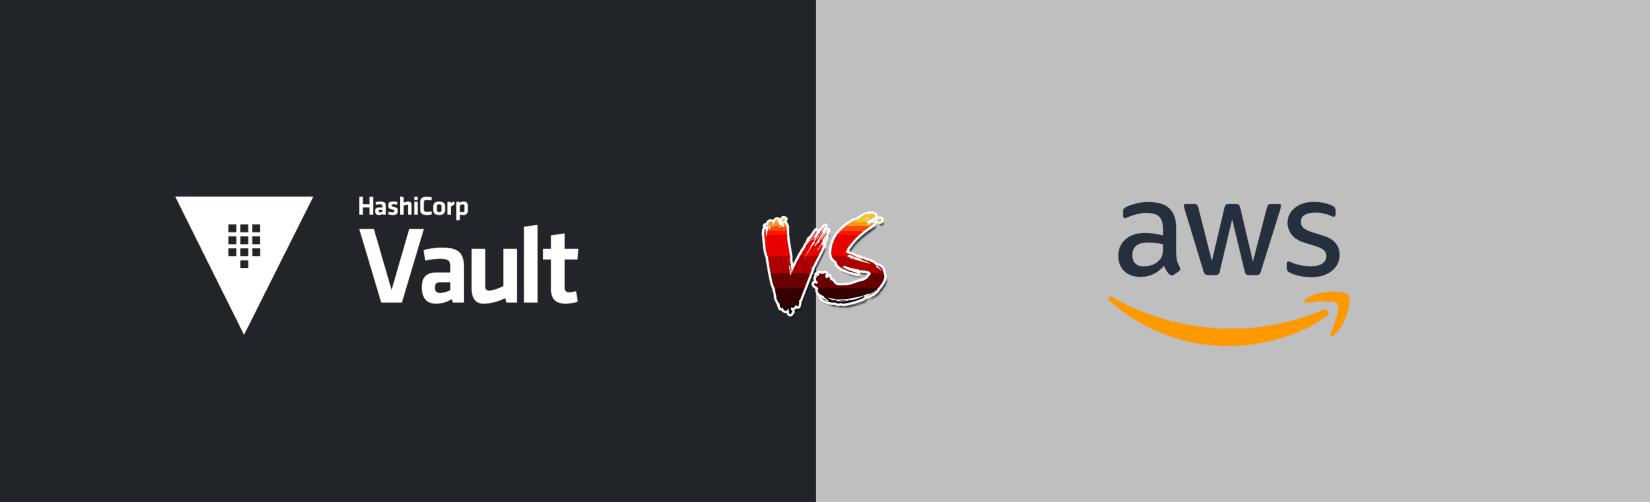 Hashicorp Vault vs AWS